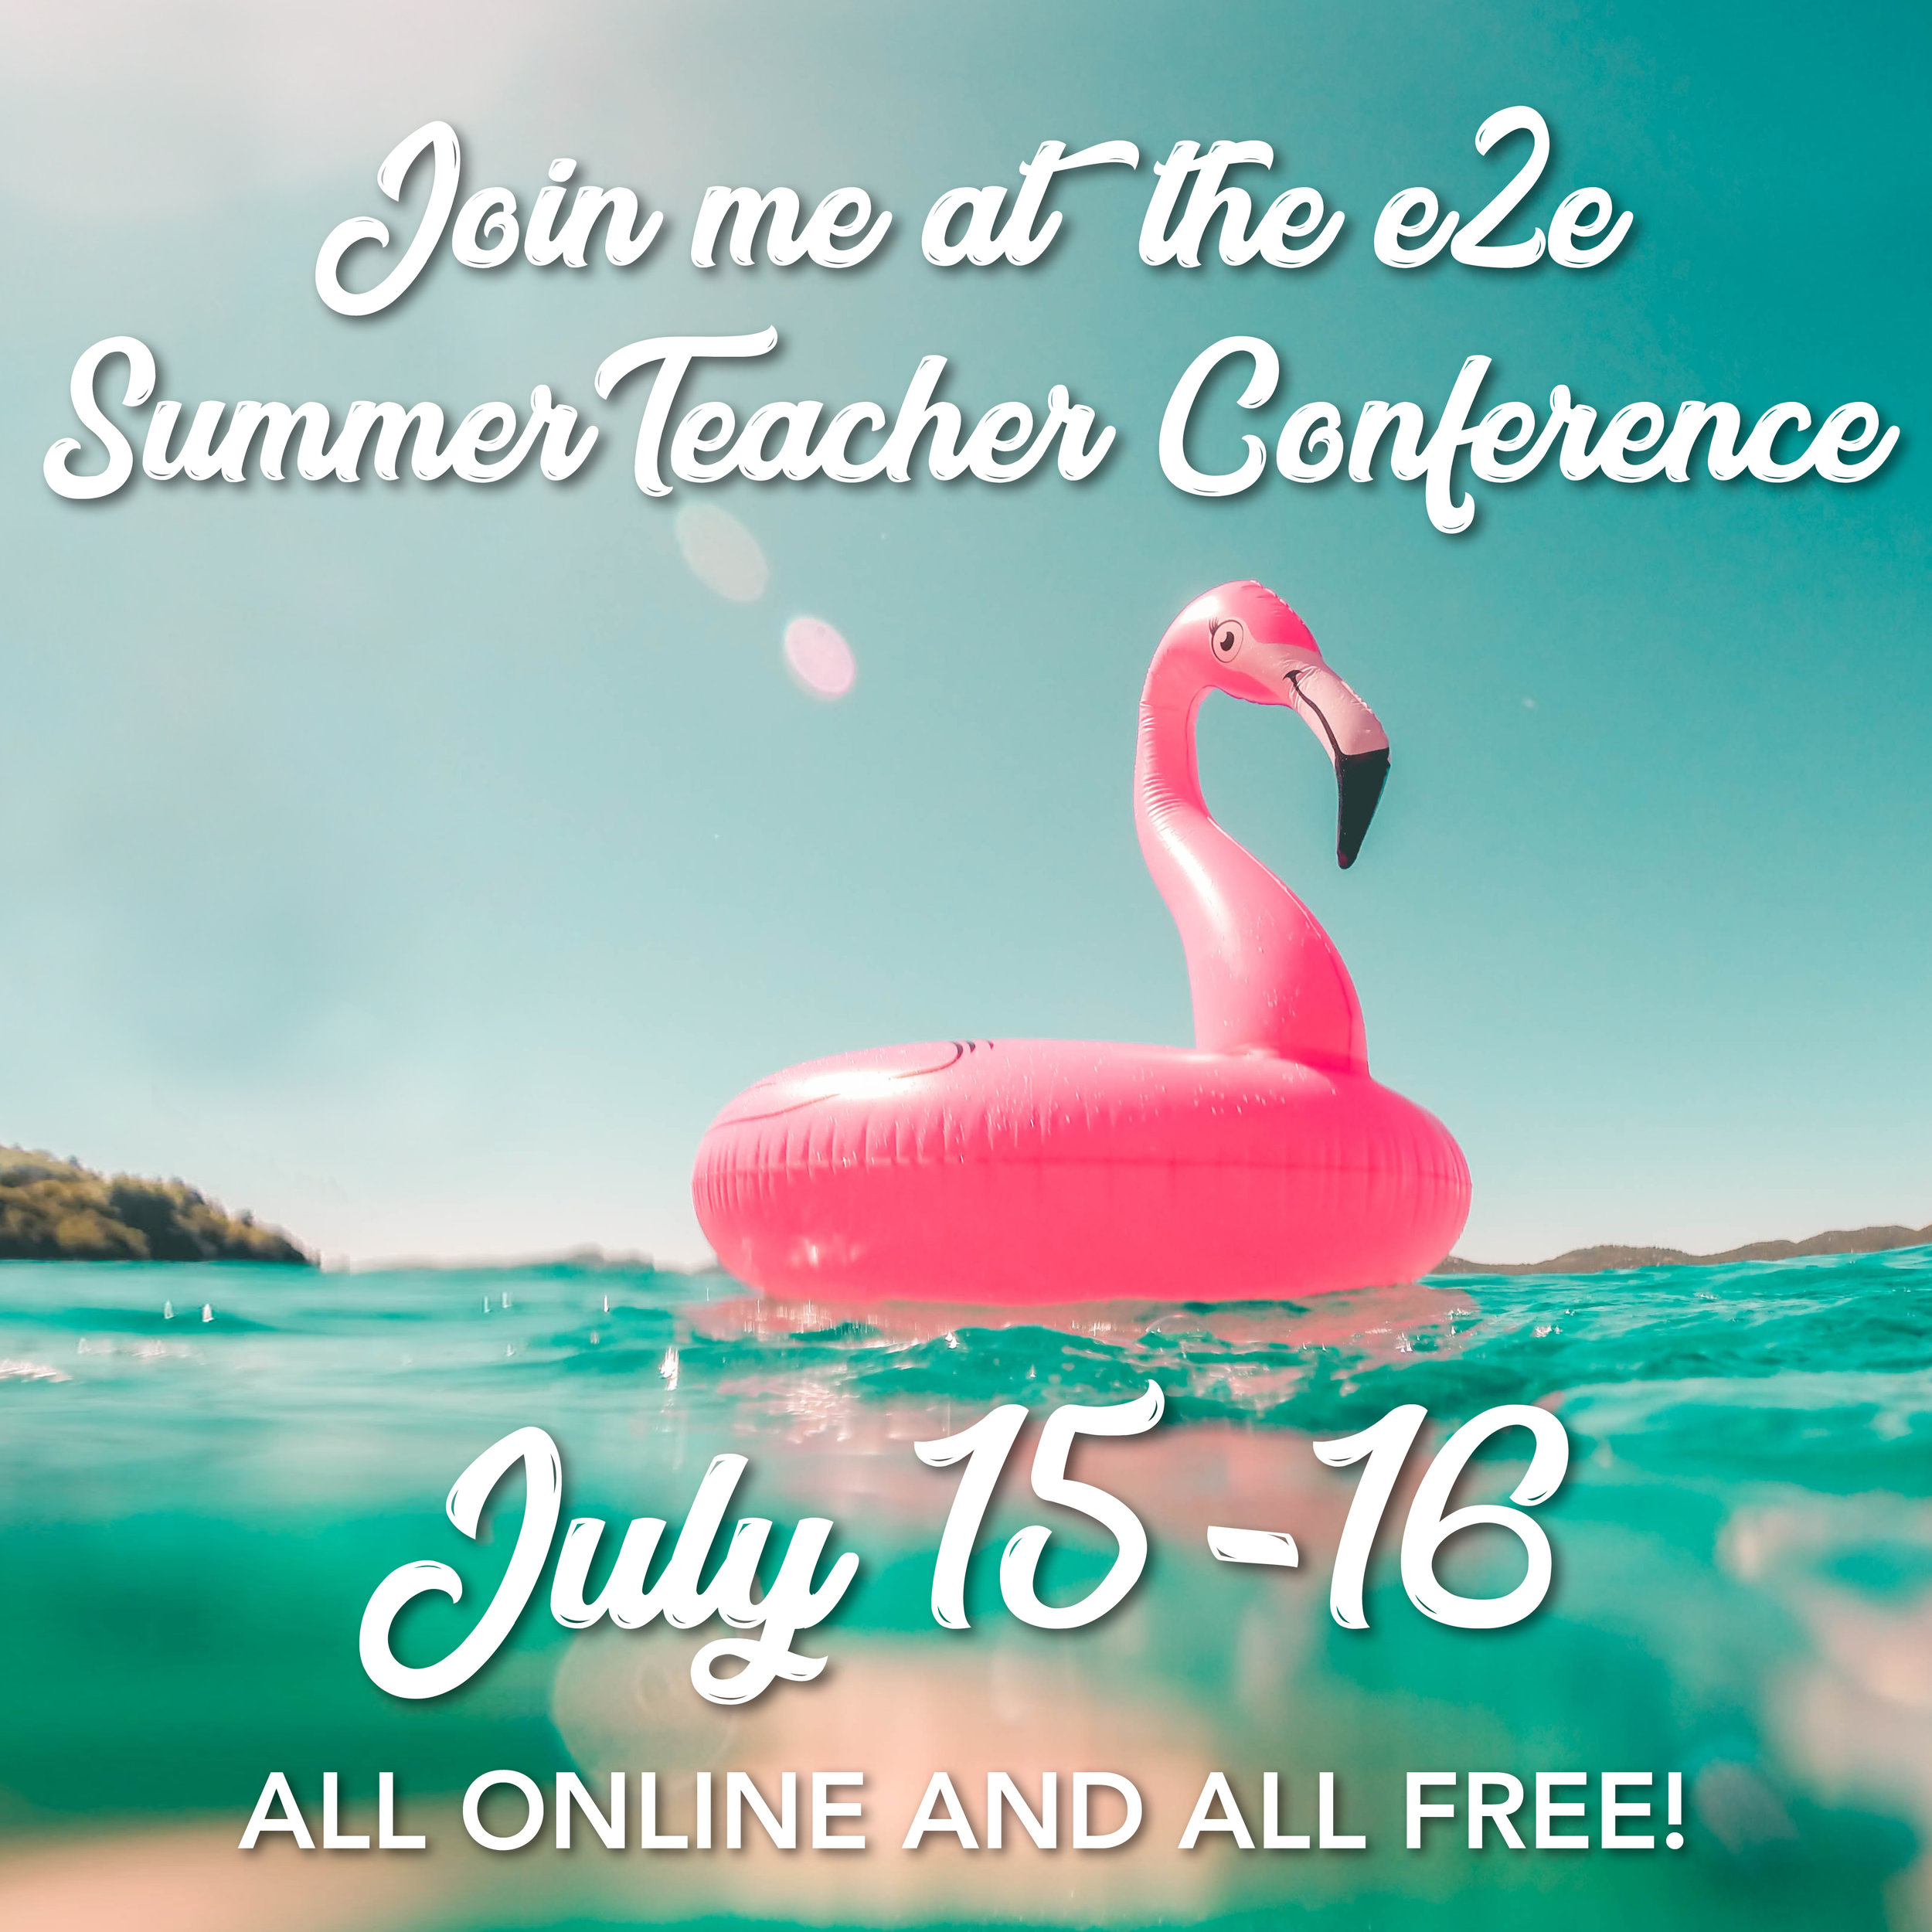 educators 2 educators summer conference